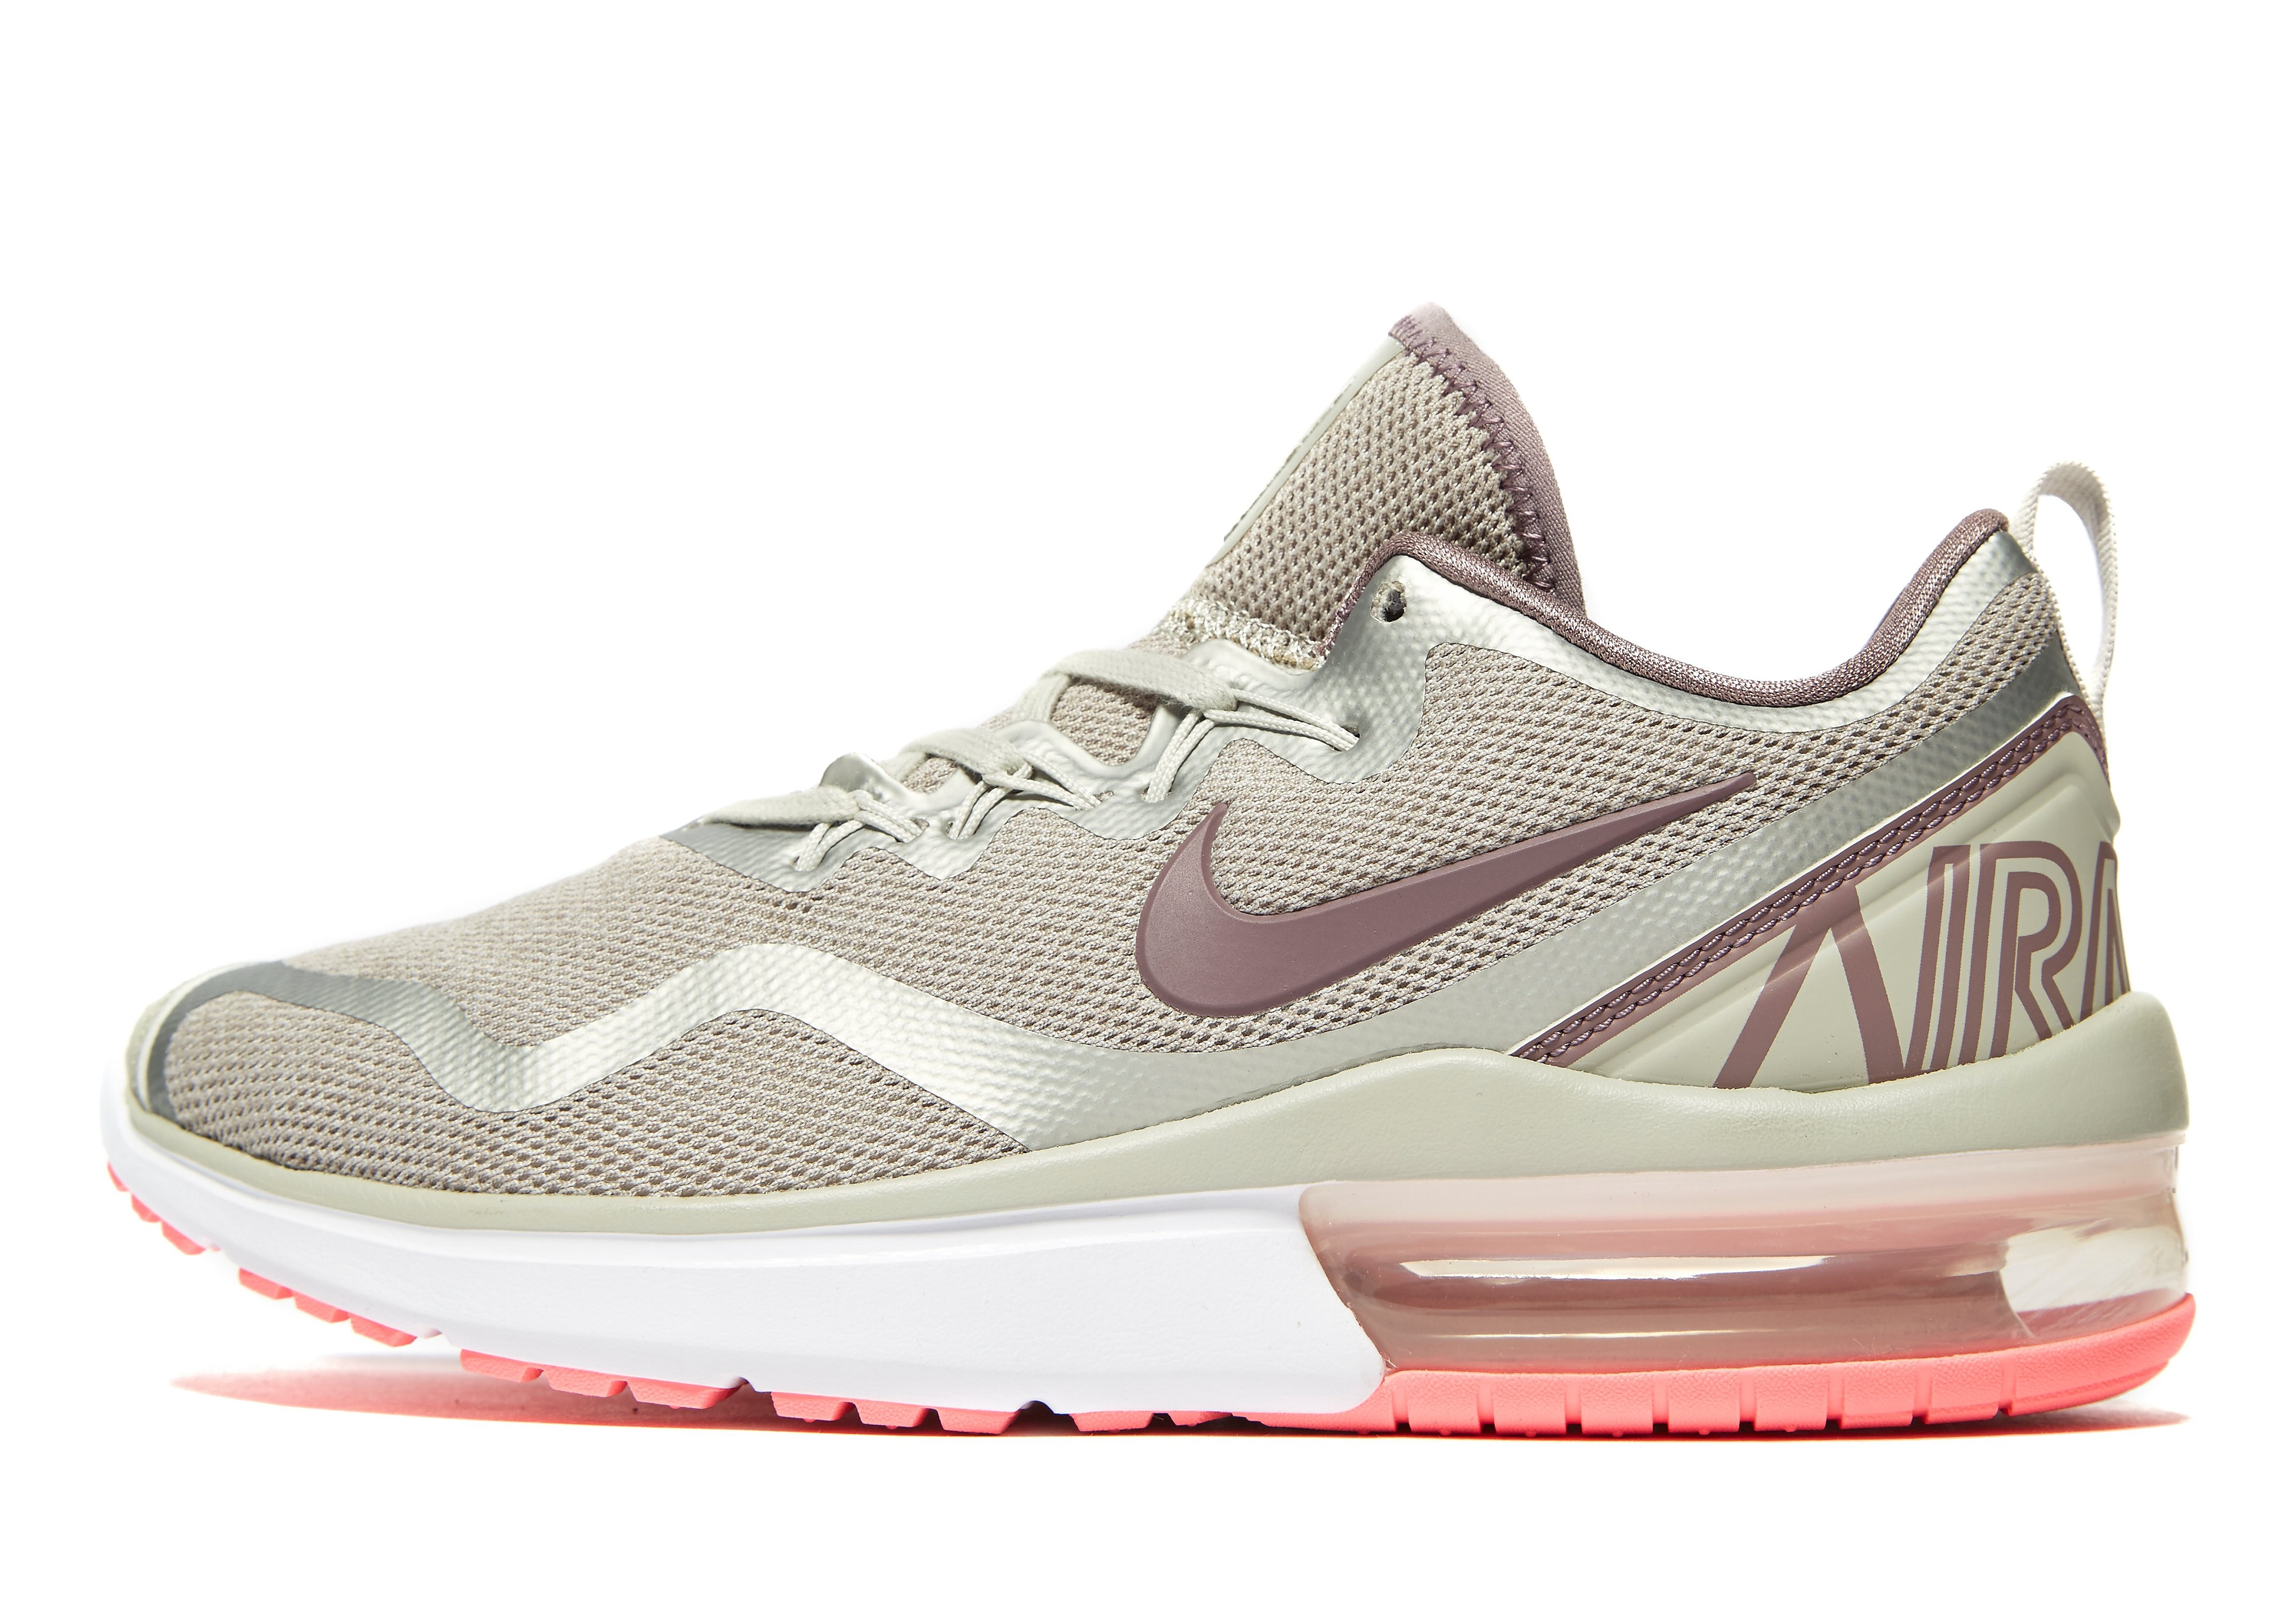 Nike Max Fury Women's